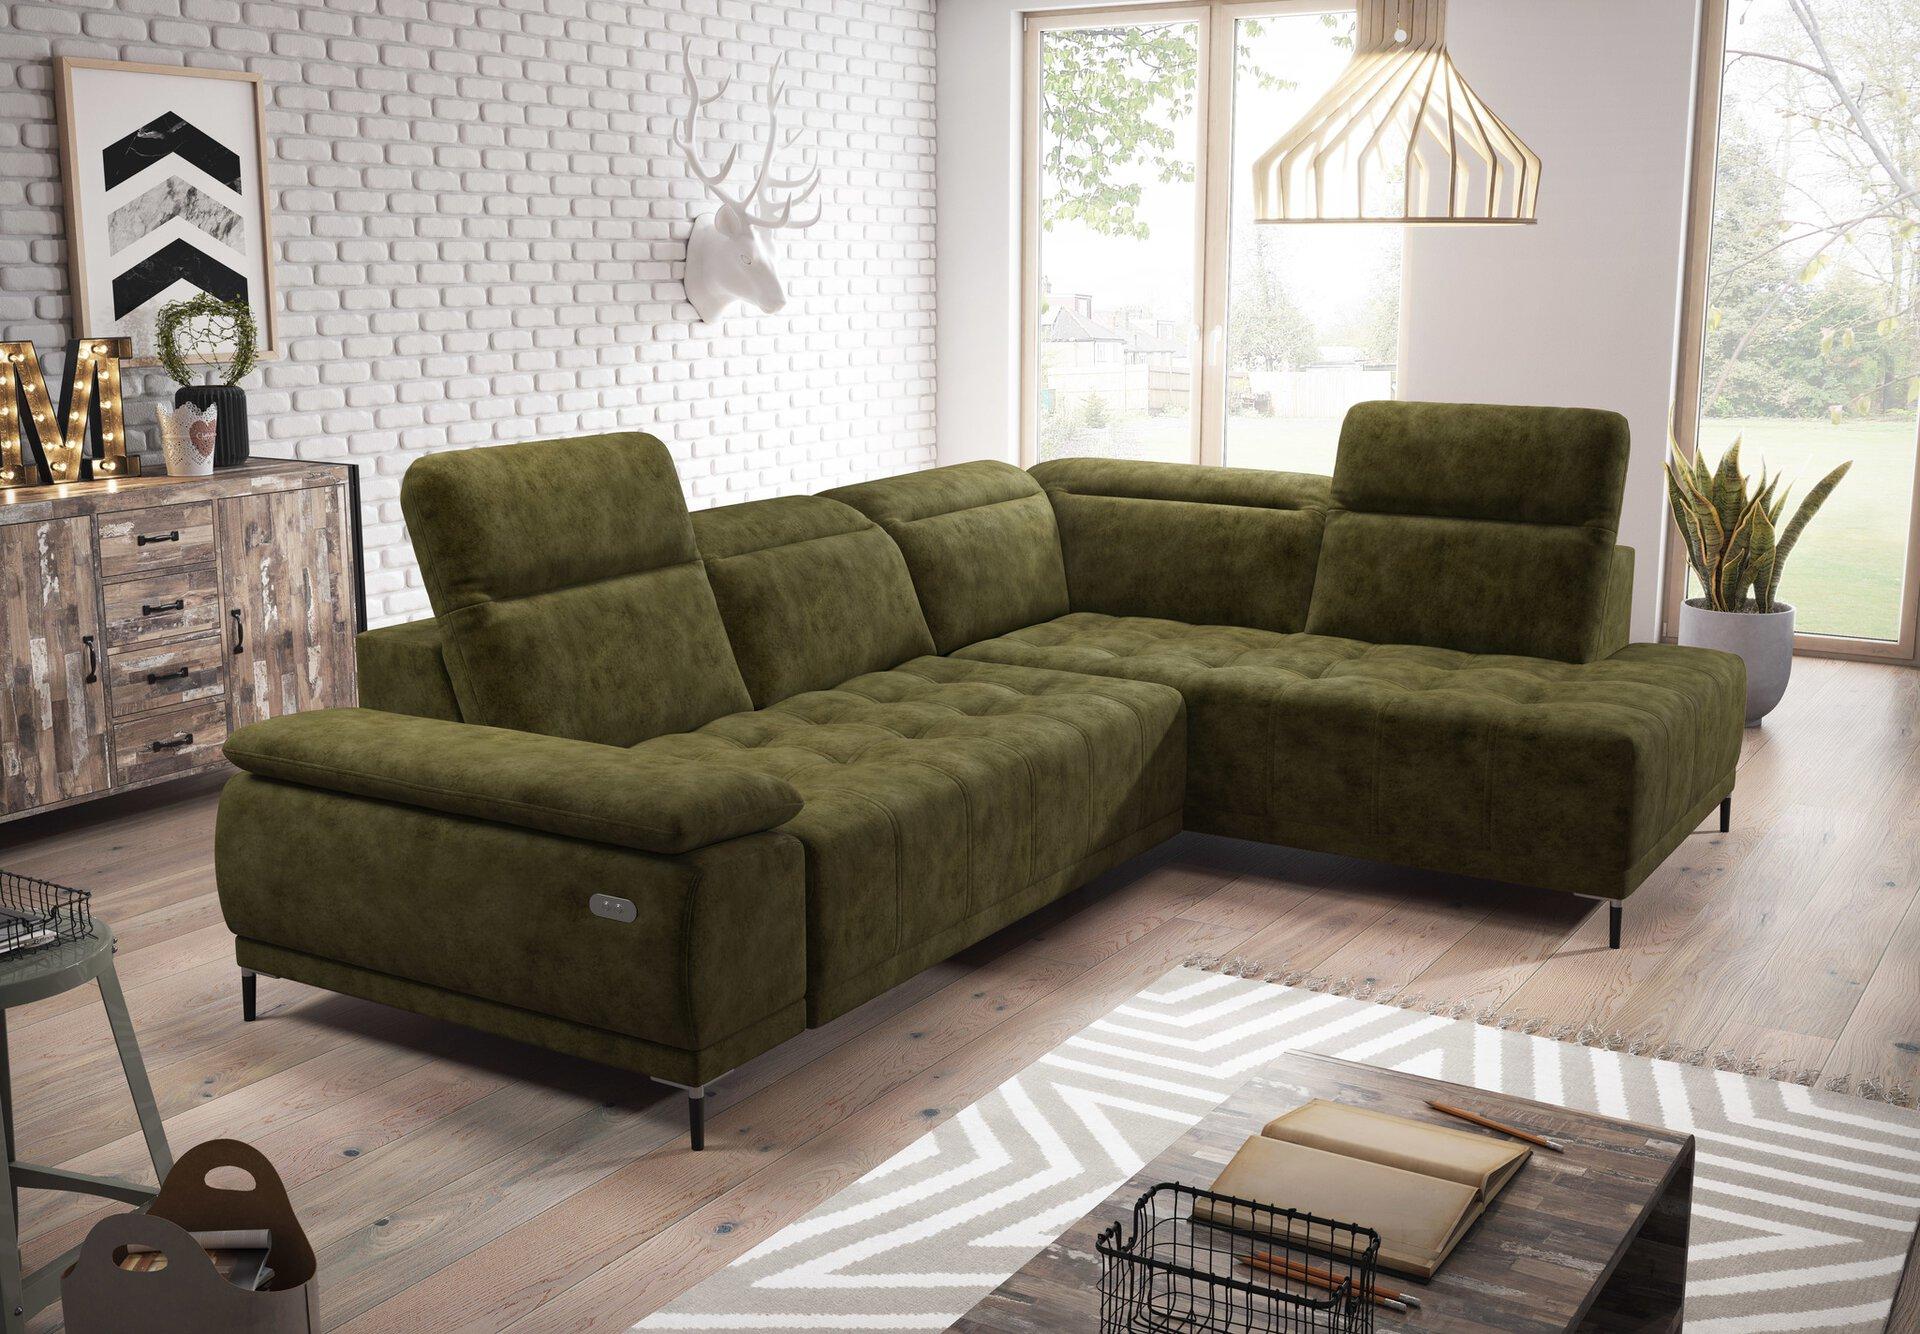 Ecksofa PRIVACY Vito Textil grün 106 x 82 x 278 cm